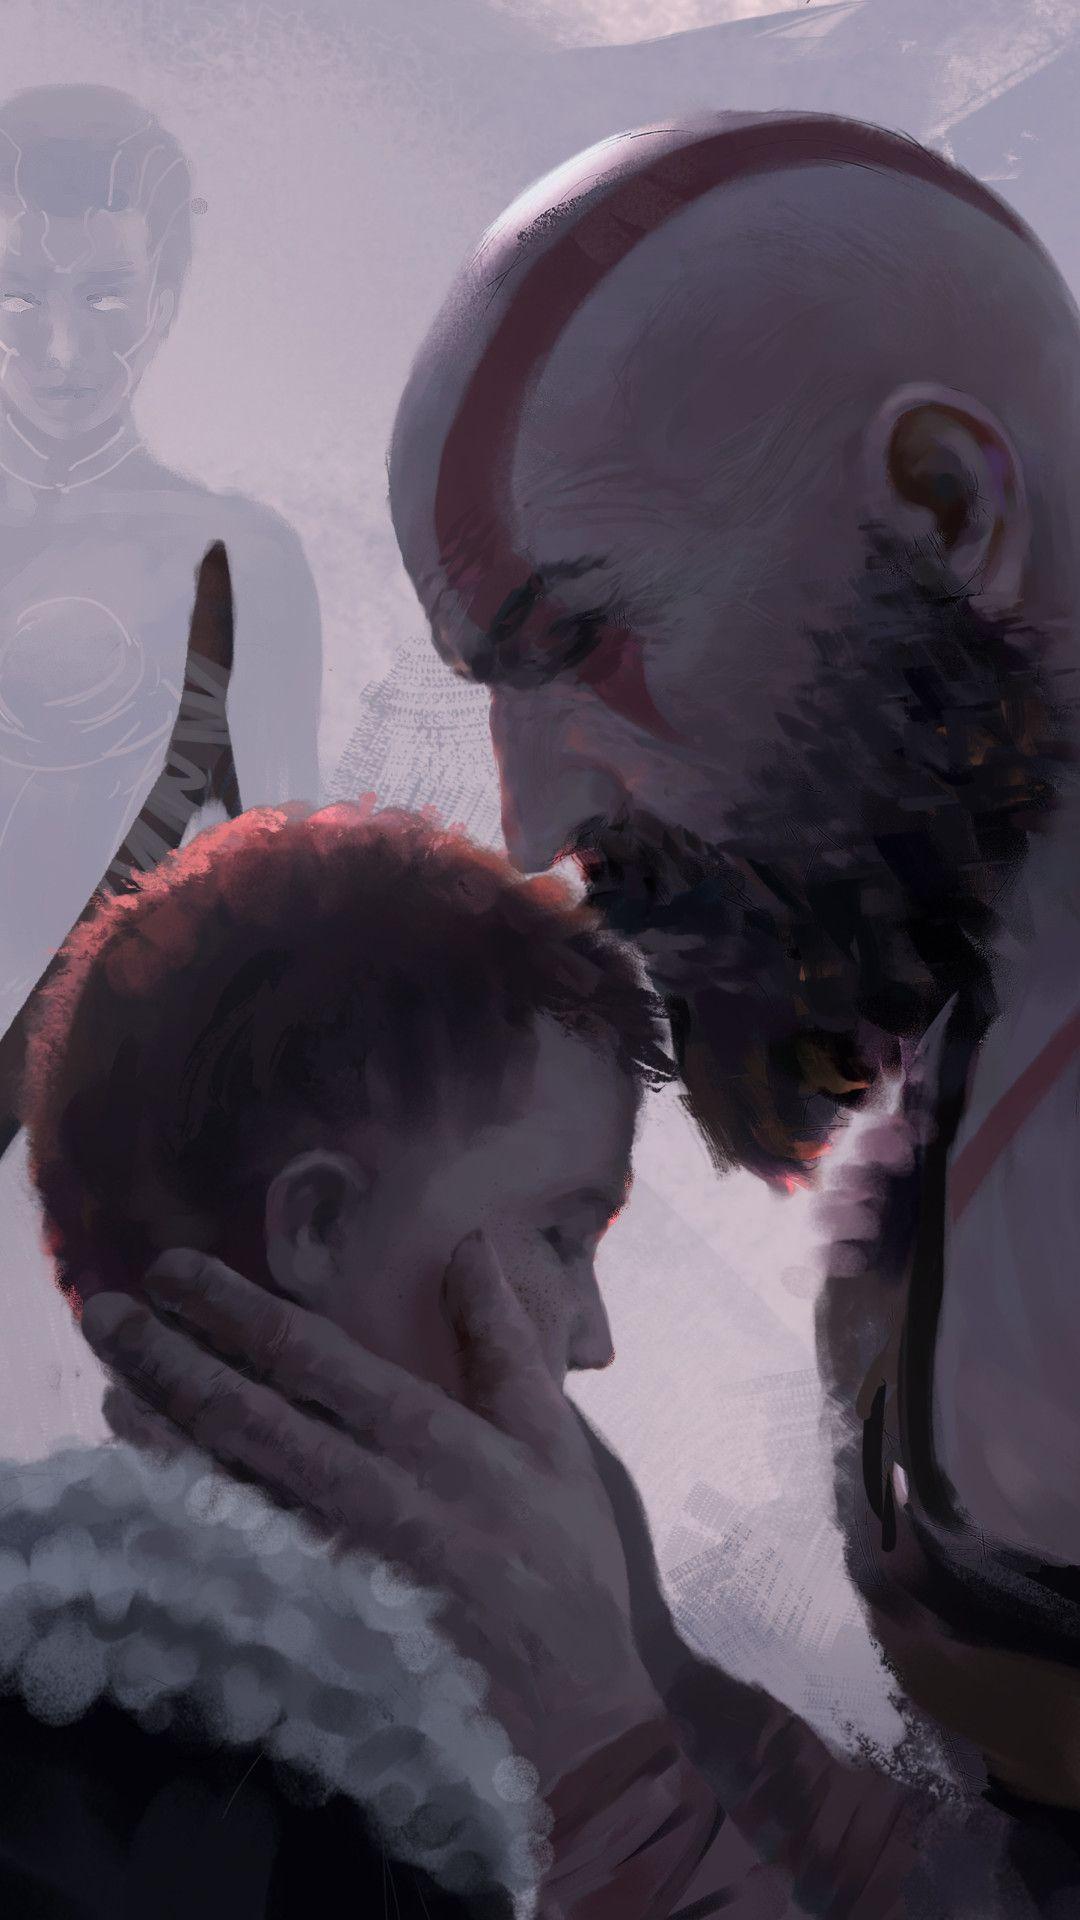 Be Safe Son God Of War 4 Mobile Wallpaper Iphone Android Samsung Pixel Xiaomi God Of War Kratos God Of War War Artwork